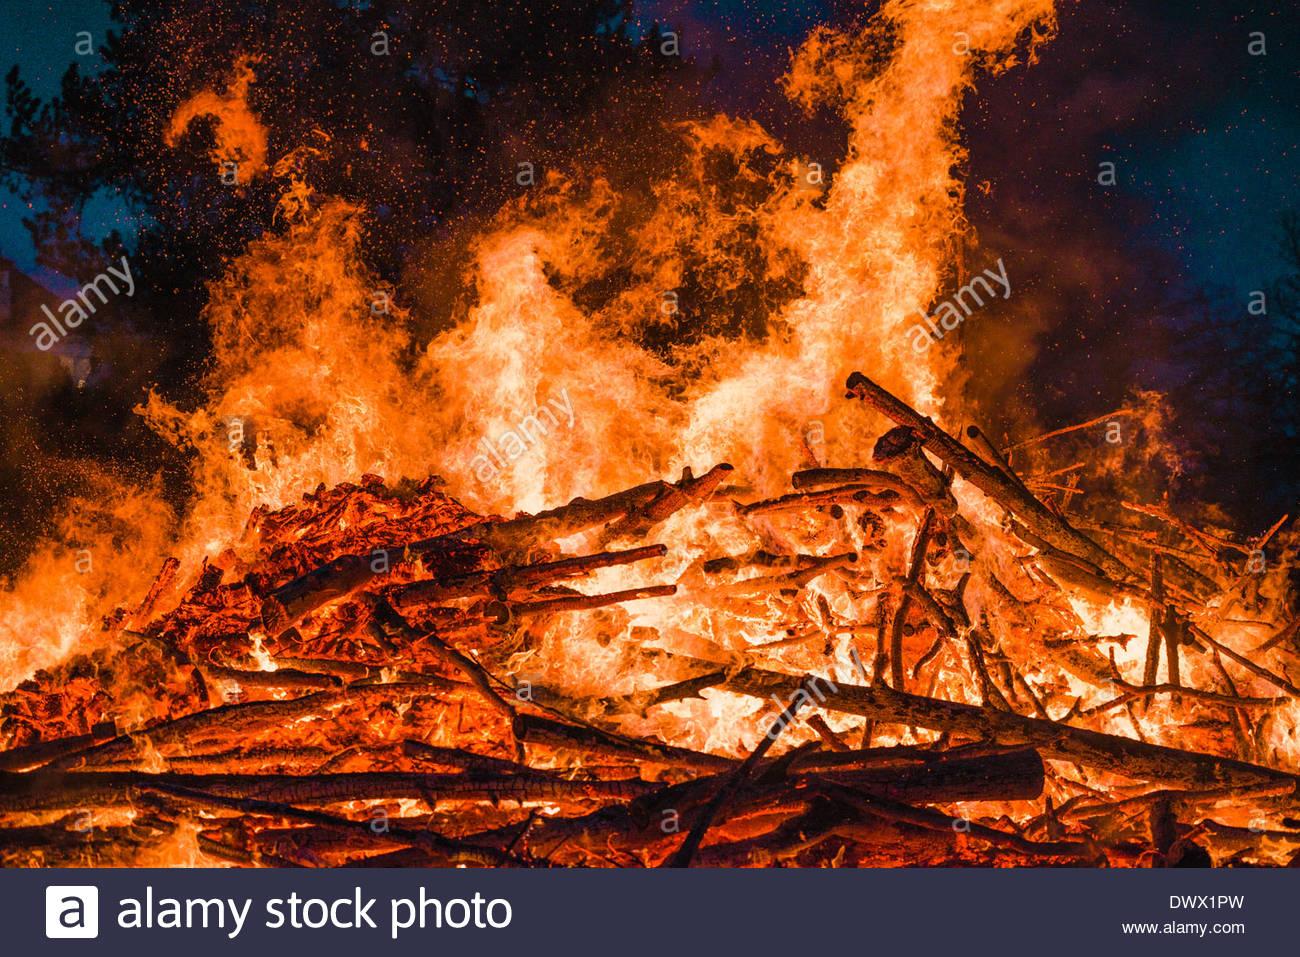 Fire burning at night - Stock Image